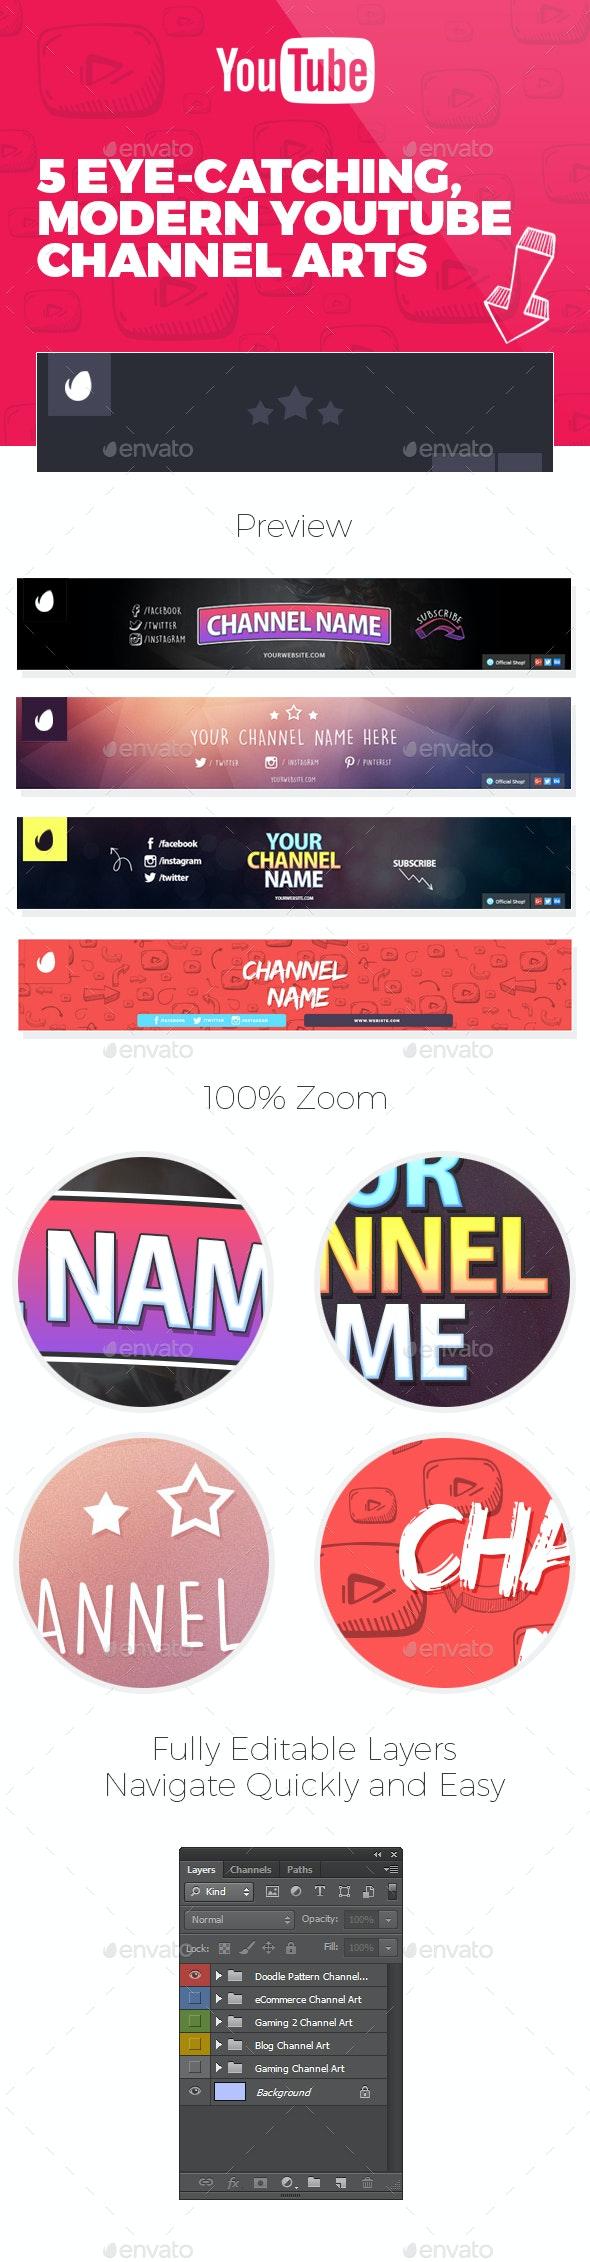 5 Youtube Channel Arts - YouTube Social Media